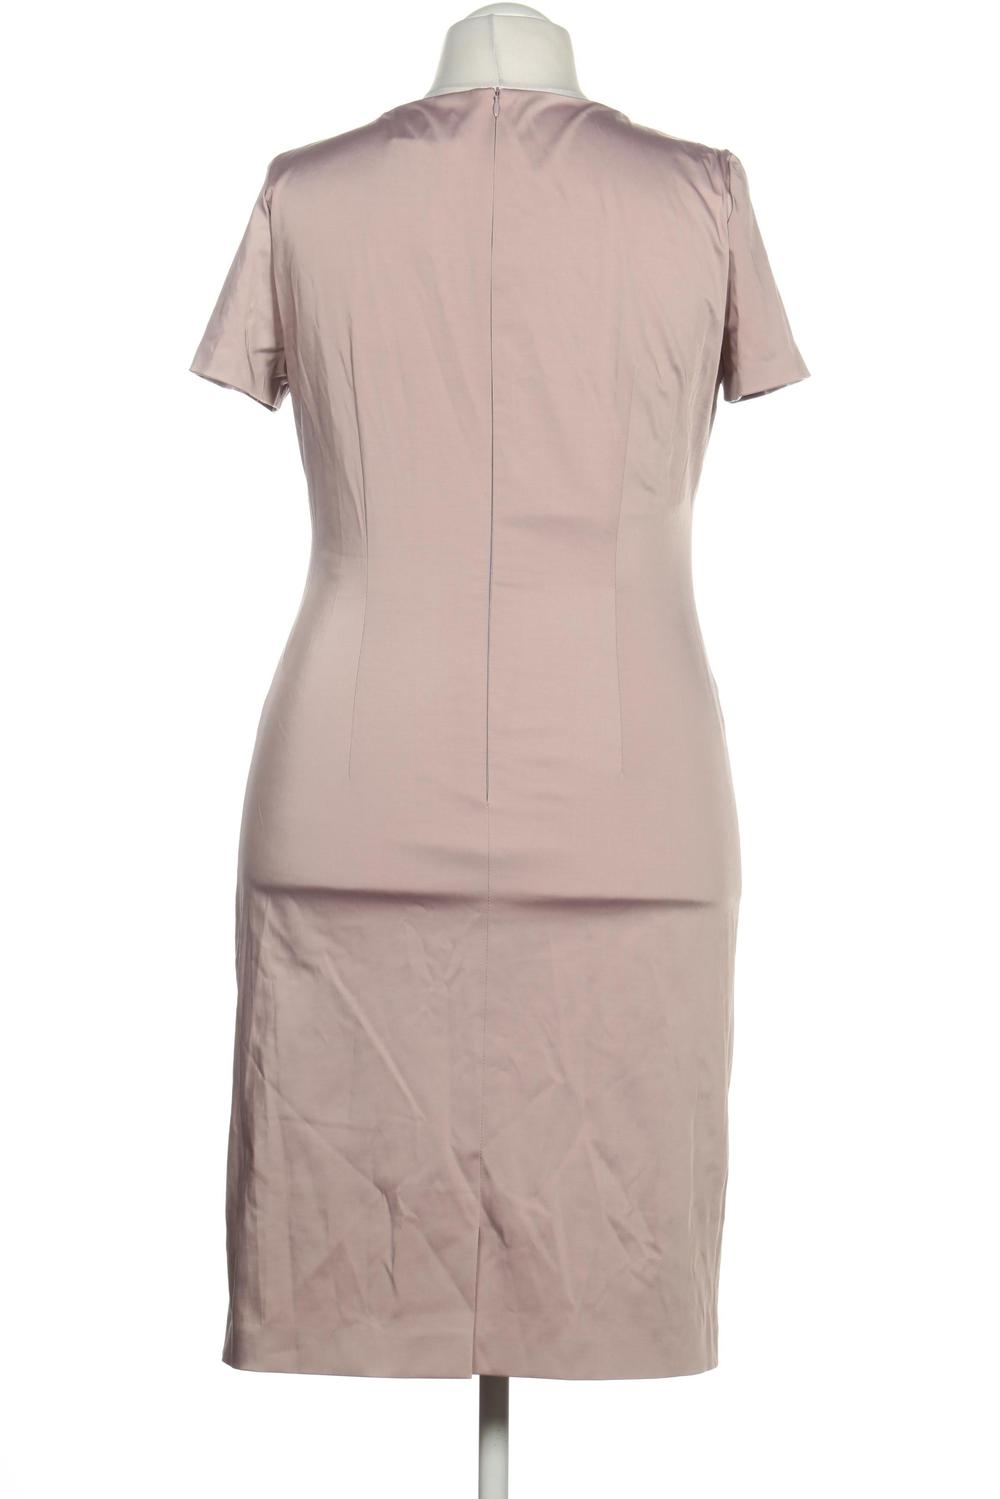 Vera Mont Damen Kleid DE 44 Second Hand kaufen | ubup